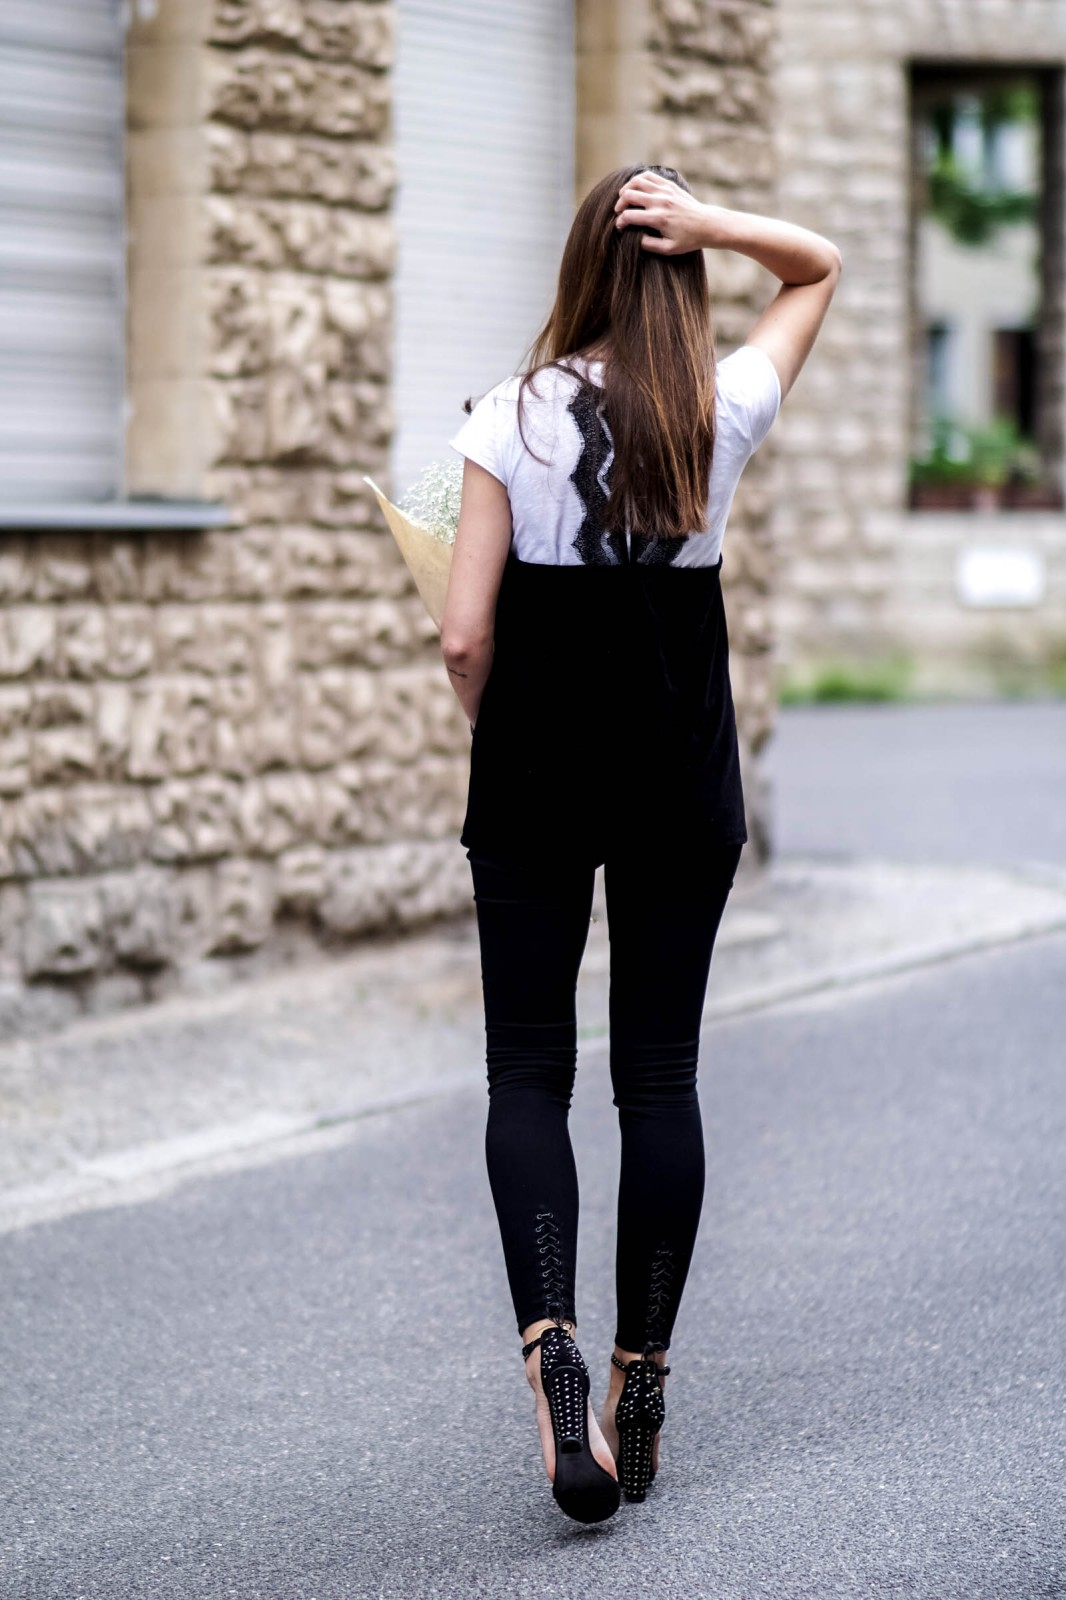 Black High Heels with studs